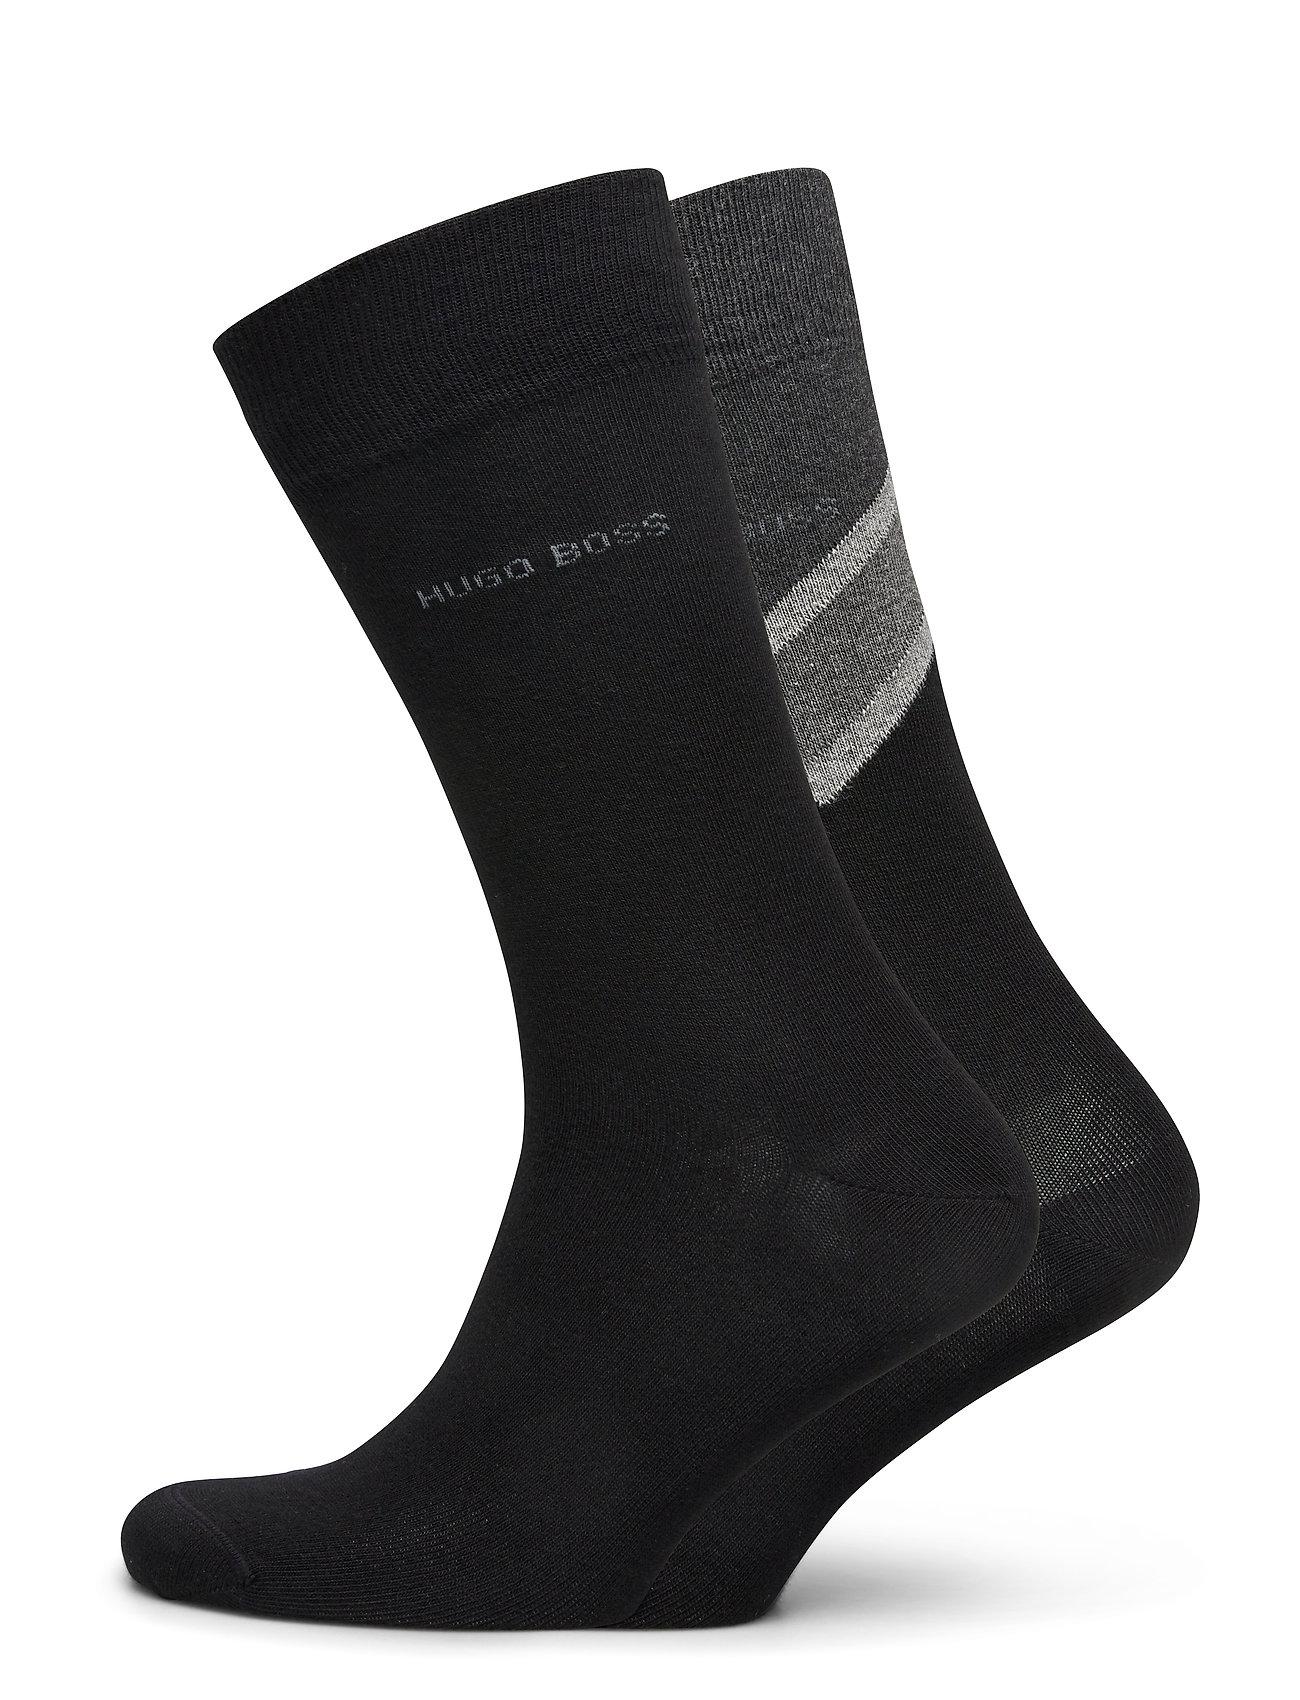 Image of 2p Rschevronstripecc Underwear Socks Regular Socks Sort BOSS (3439674977)